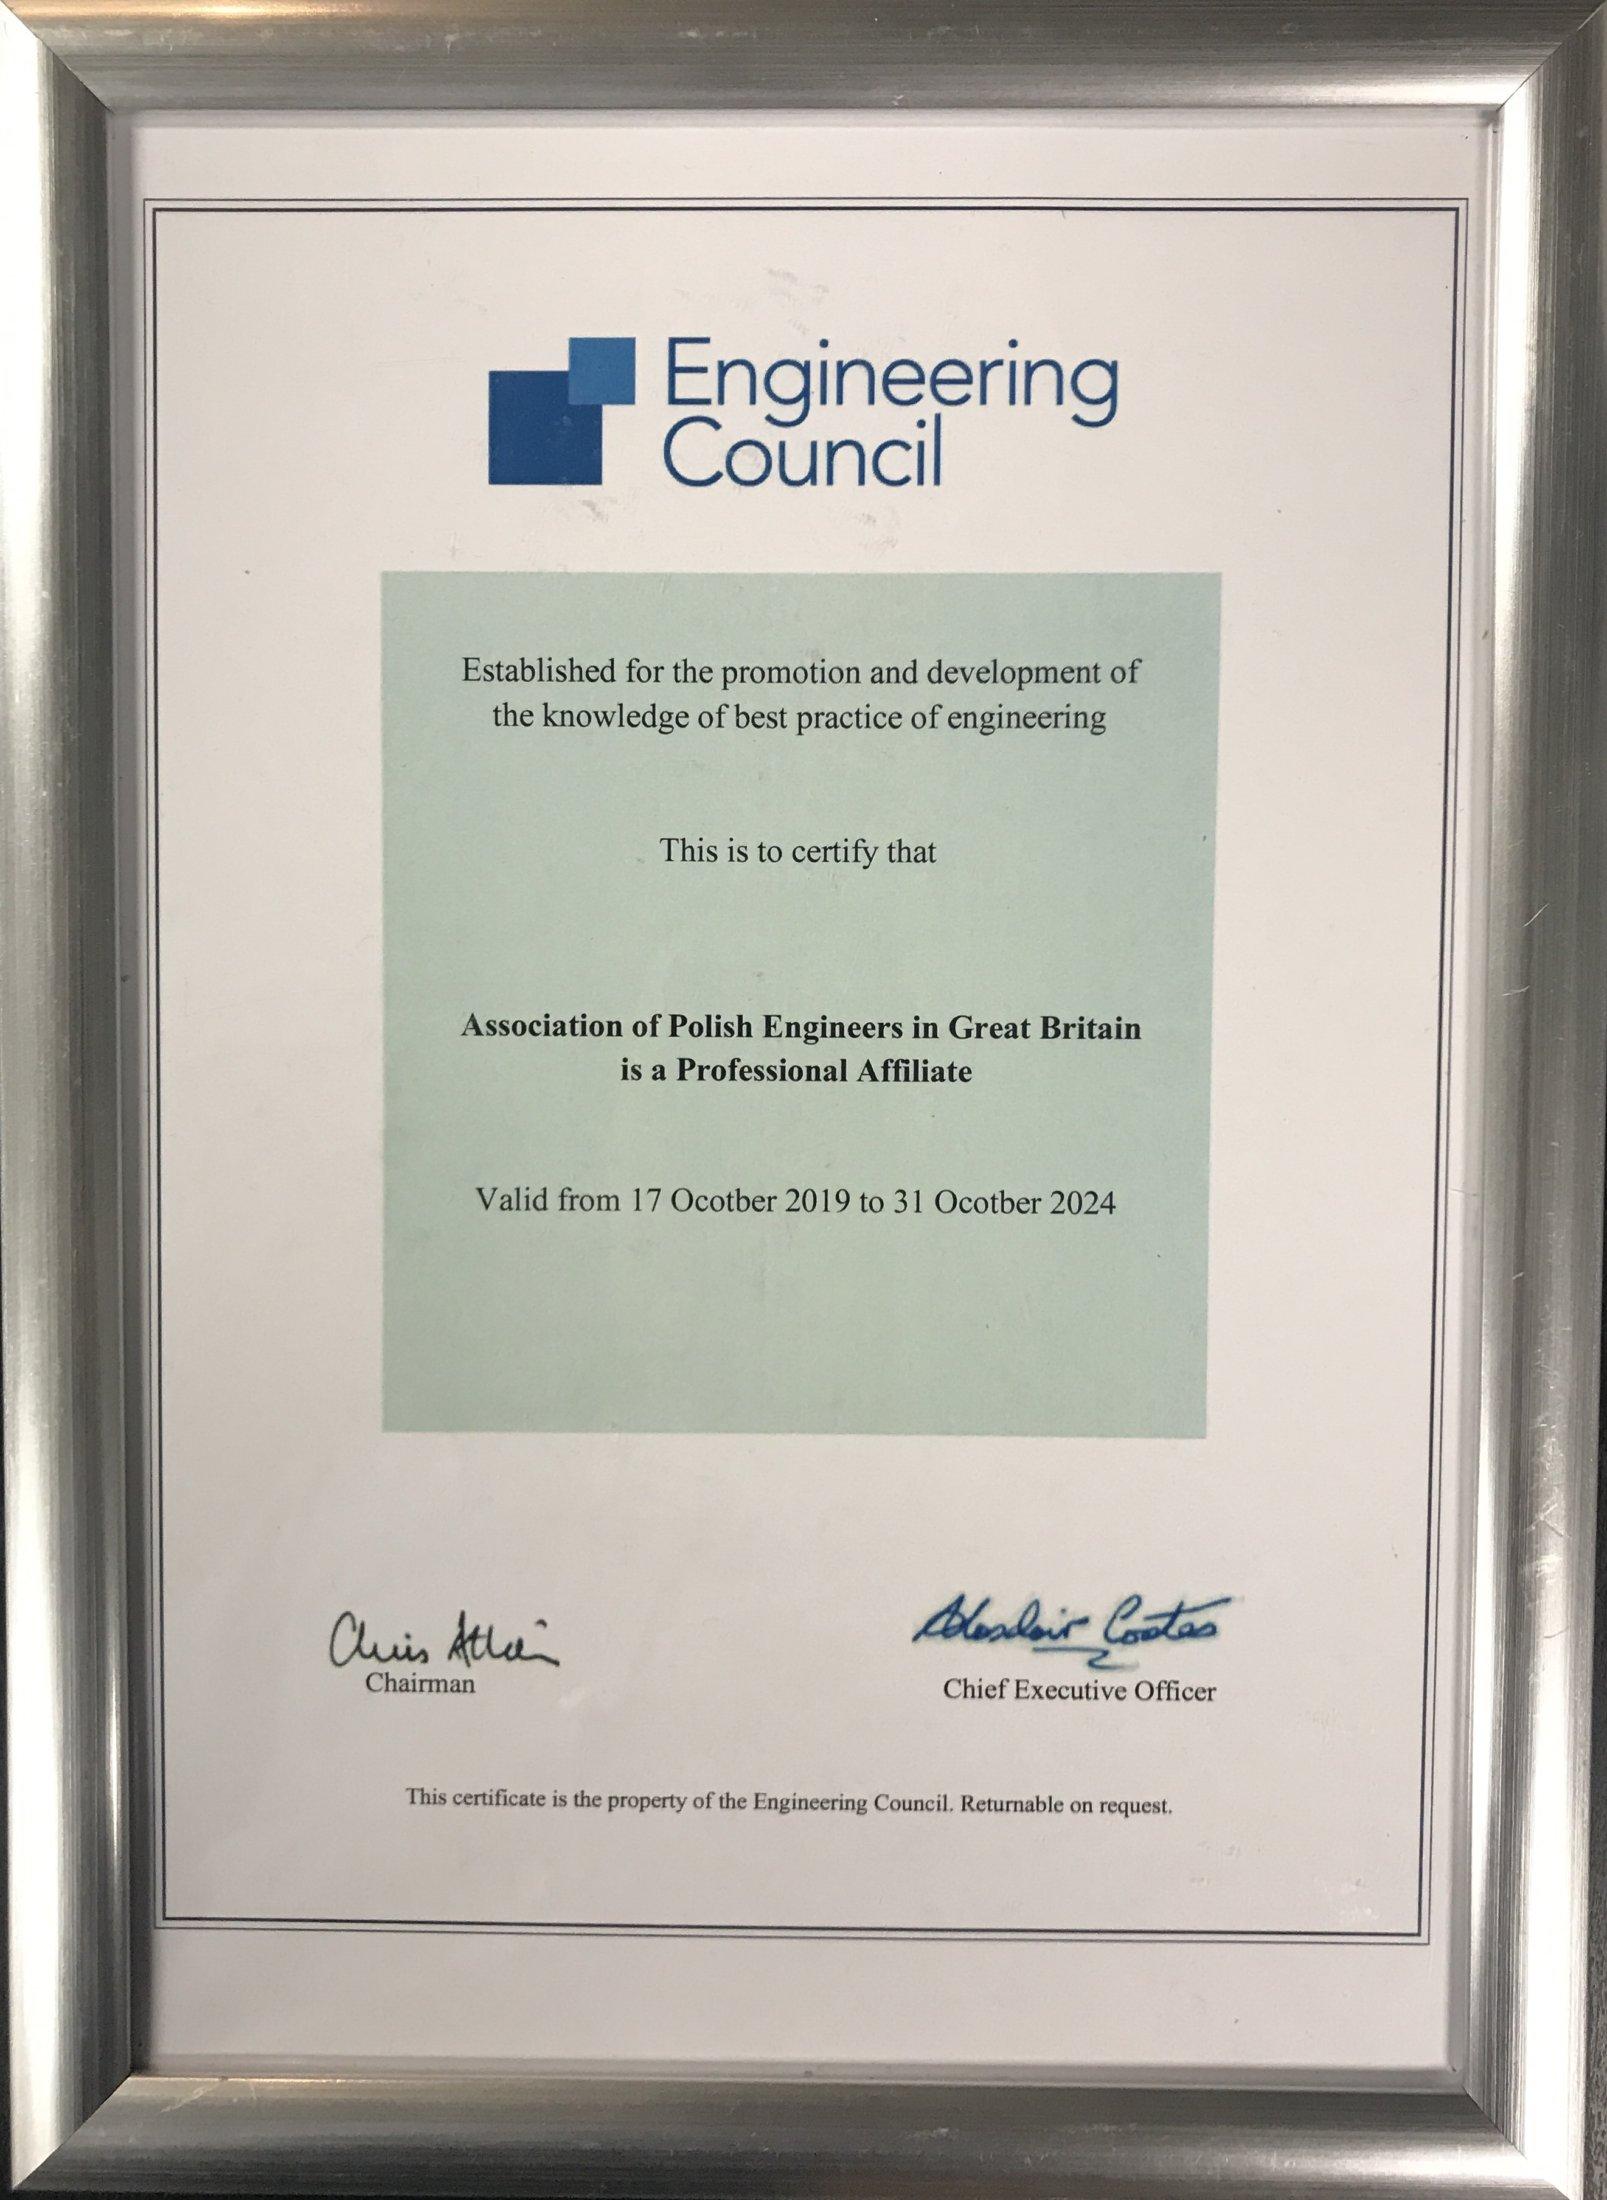 EngCouncil Certificate